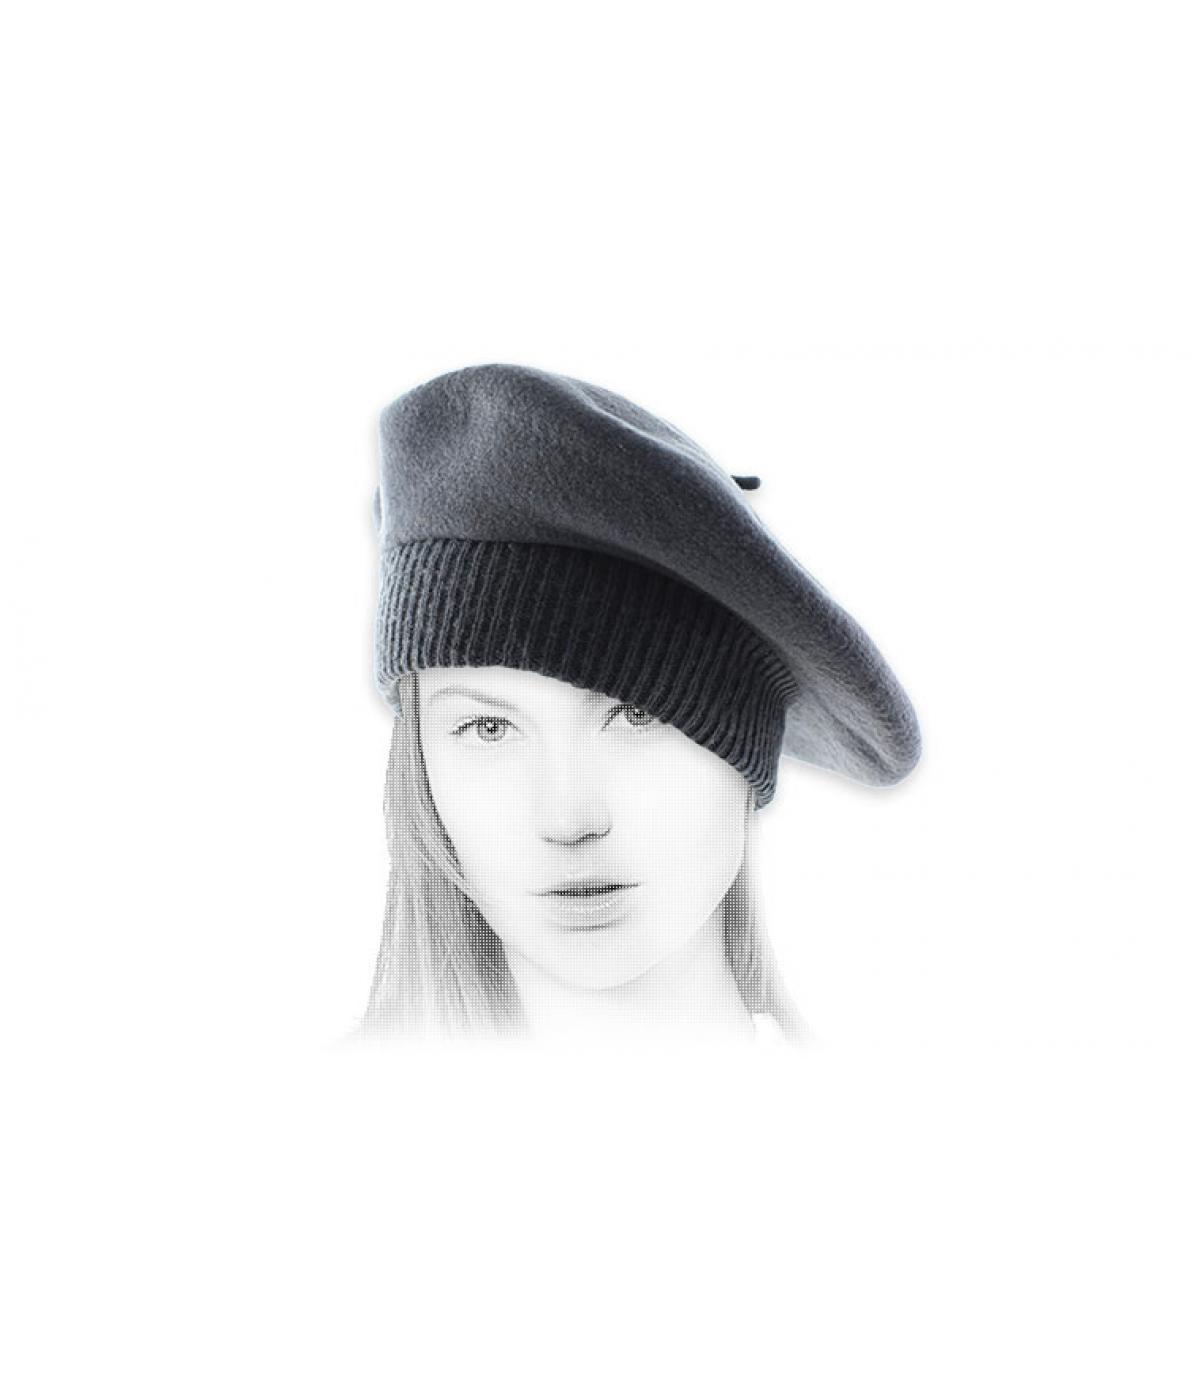 baret grijze geribde